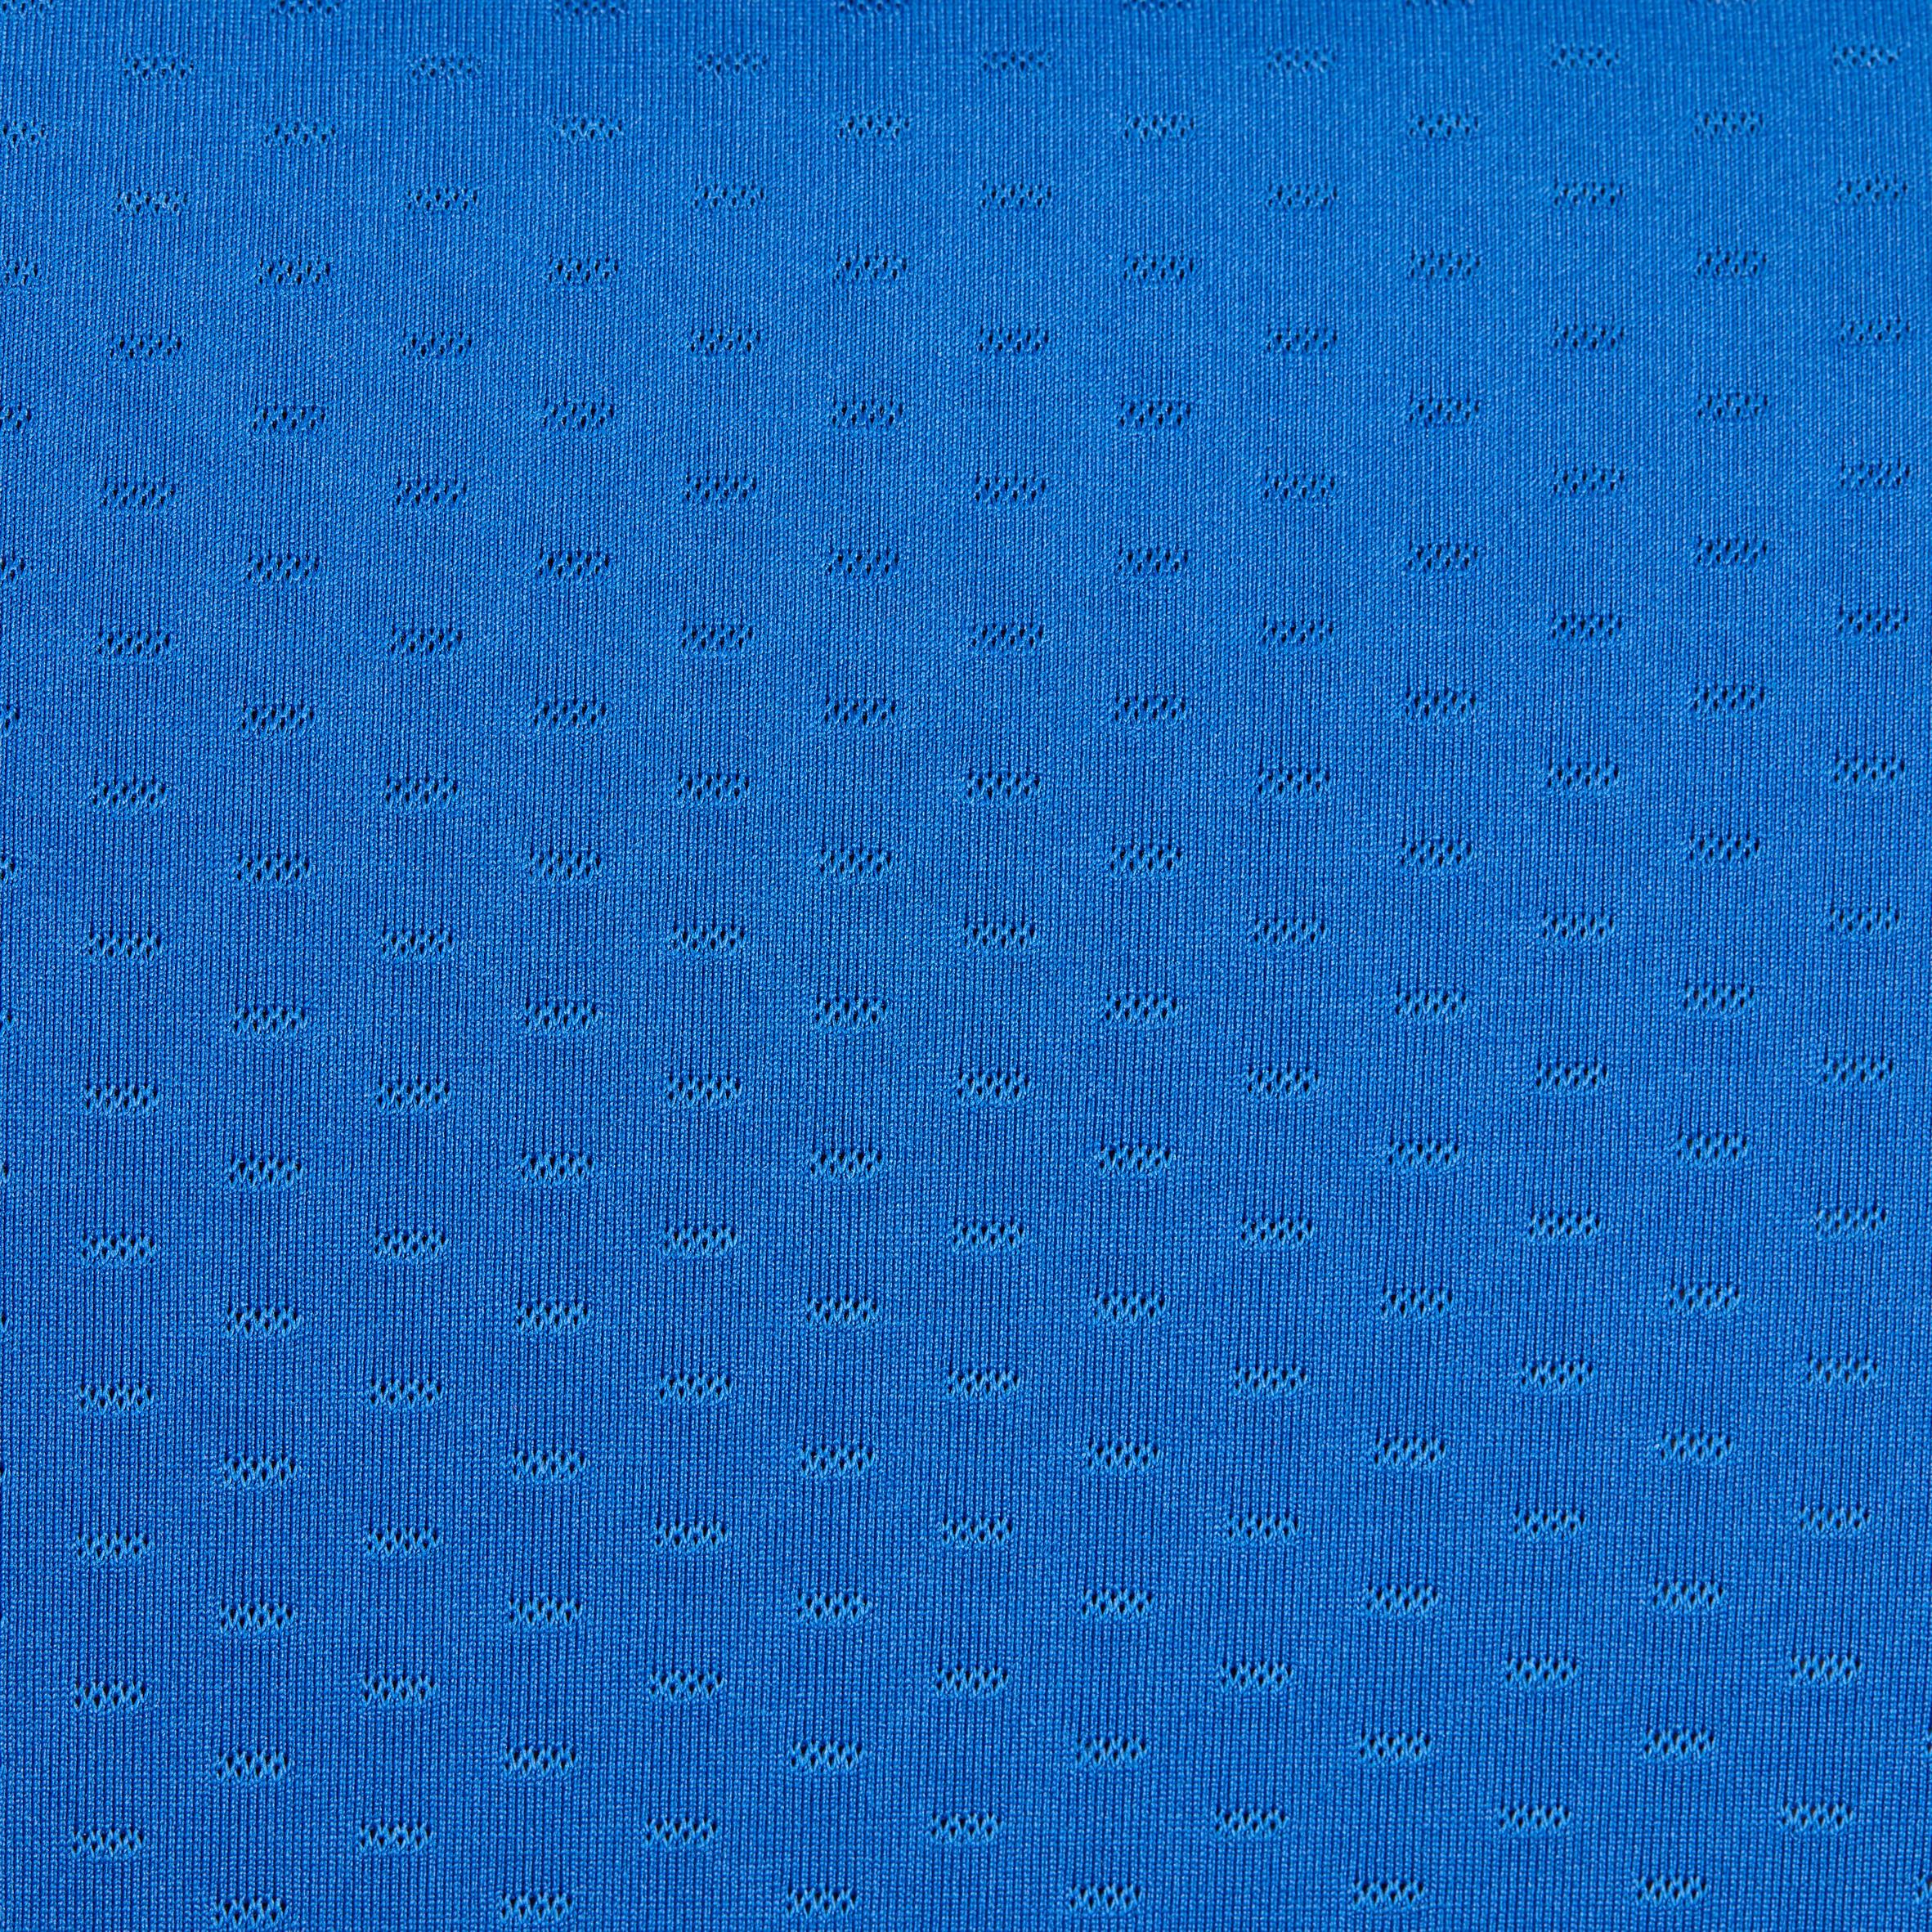 MEN'S BADMINTON T-SHIRT 860 - LIGHT BLUE